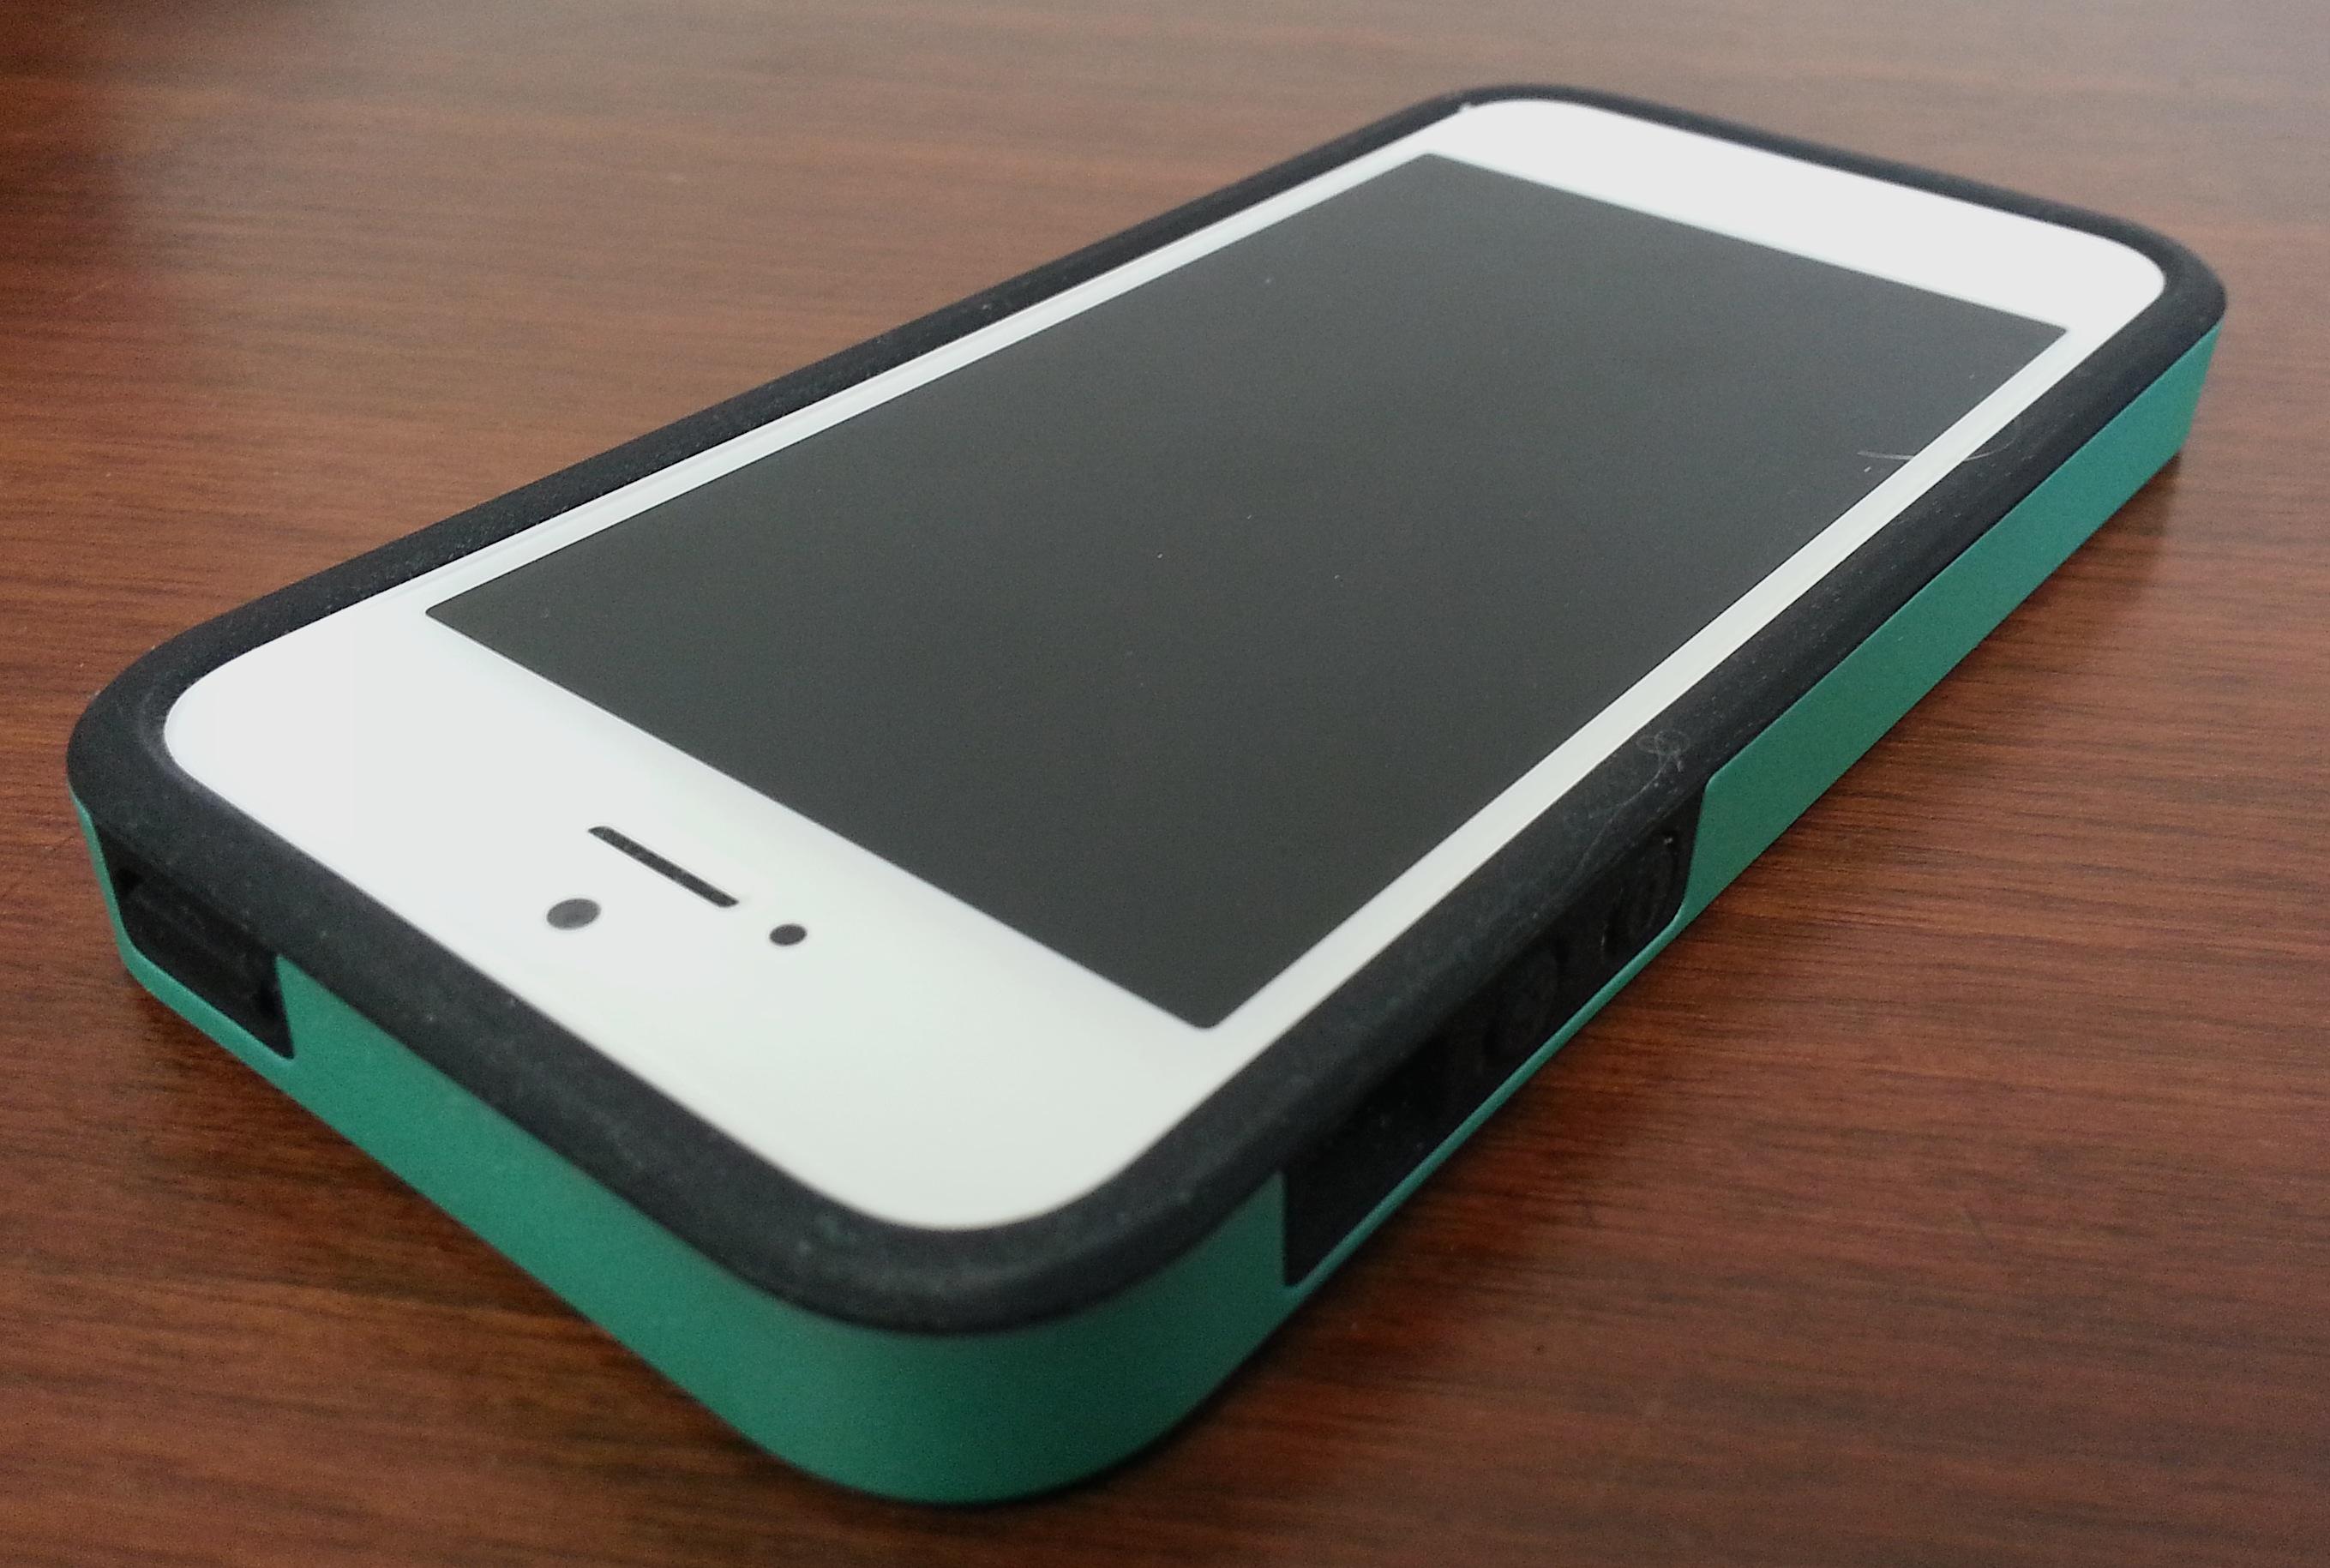 Acase Superleggera Pro iPhone 5 Case with dual layer protection